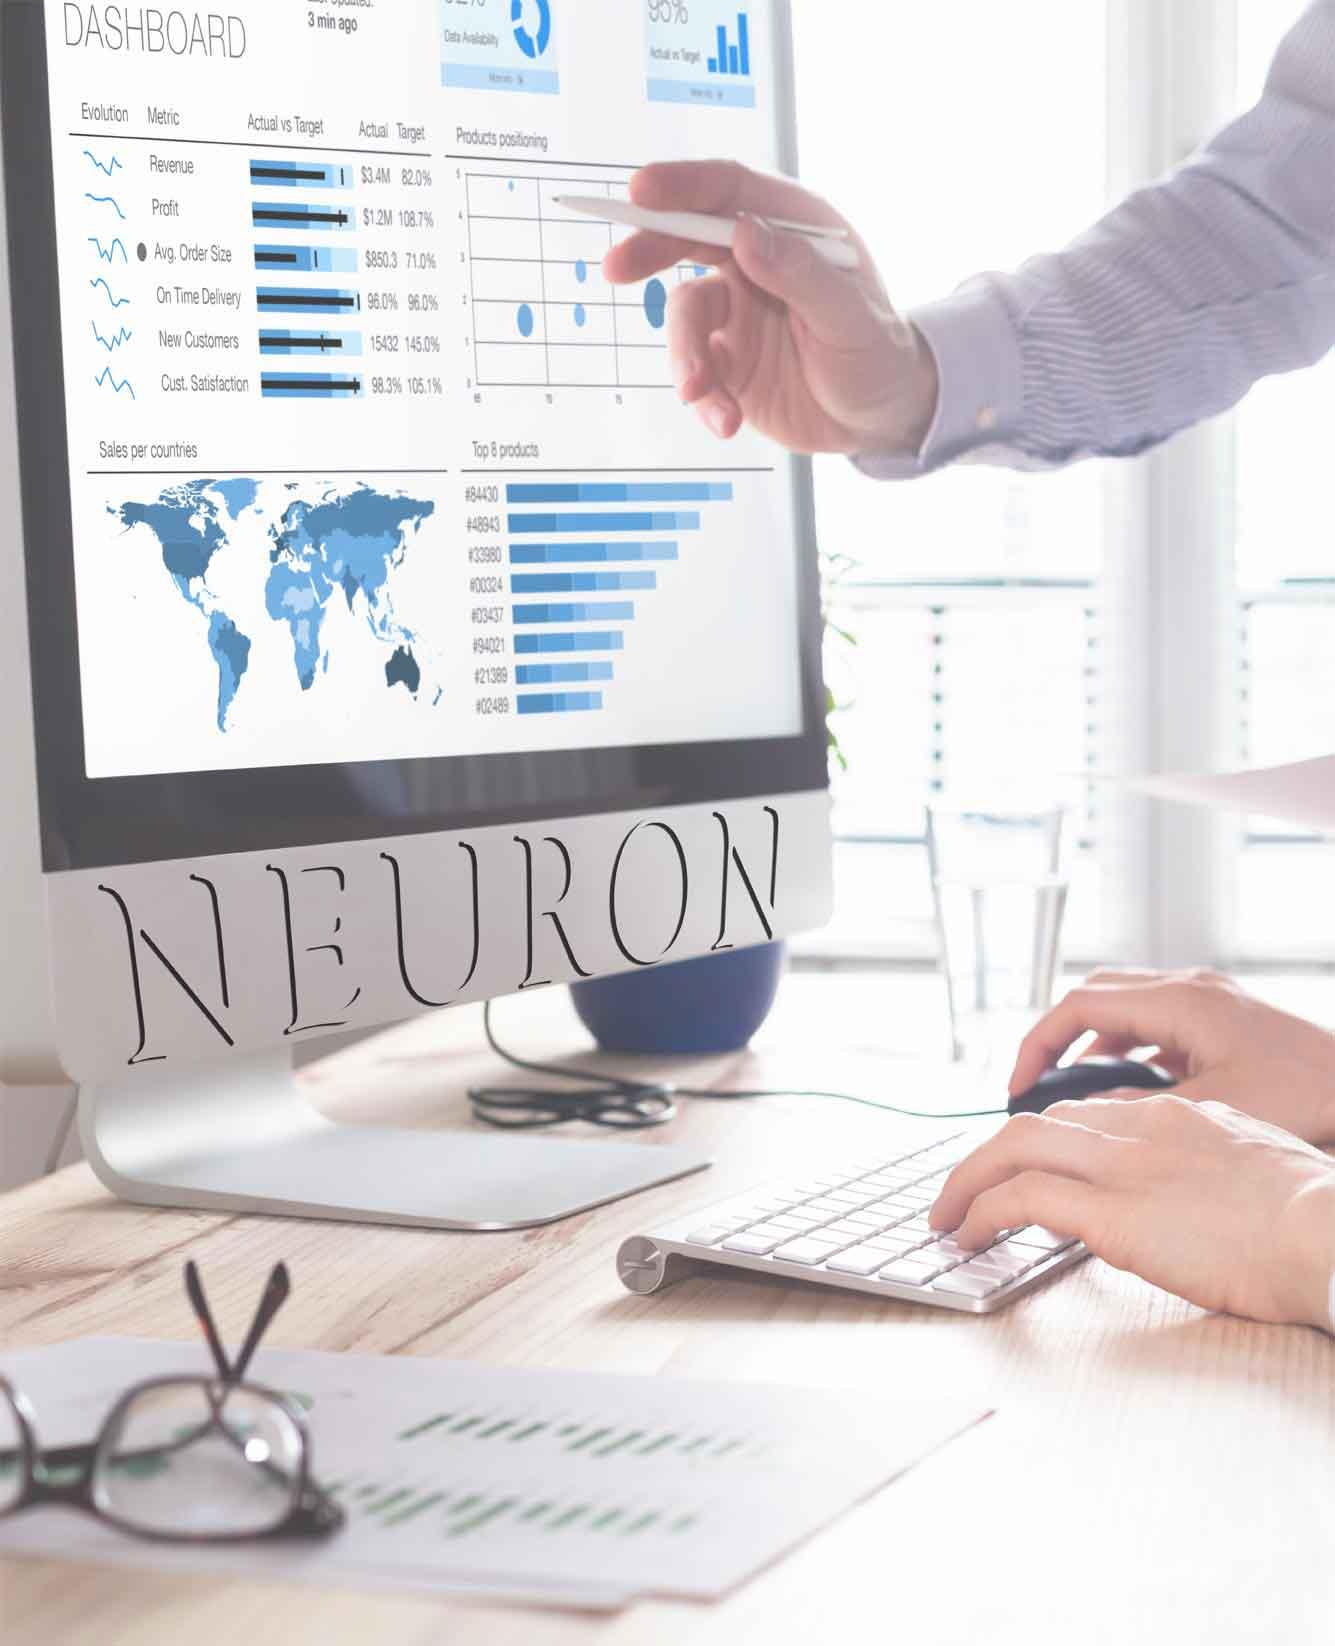 Neuron - What We Do